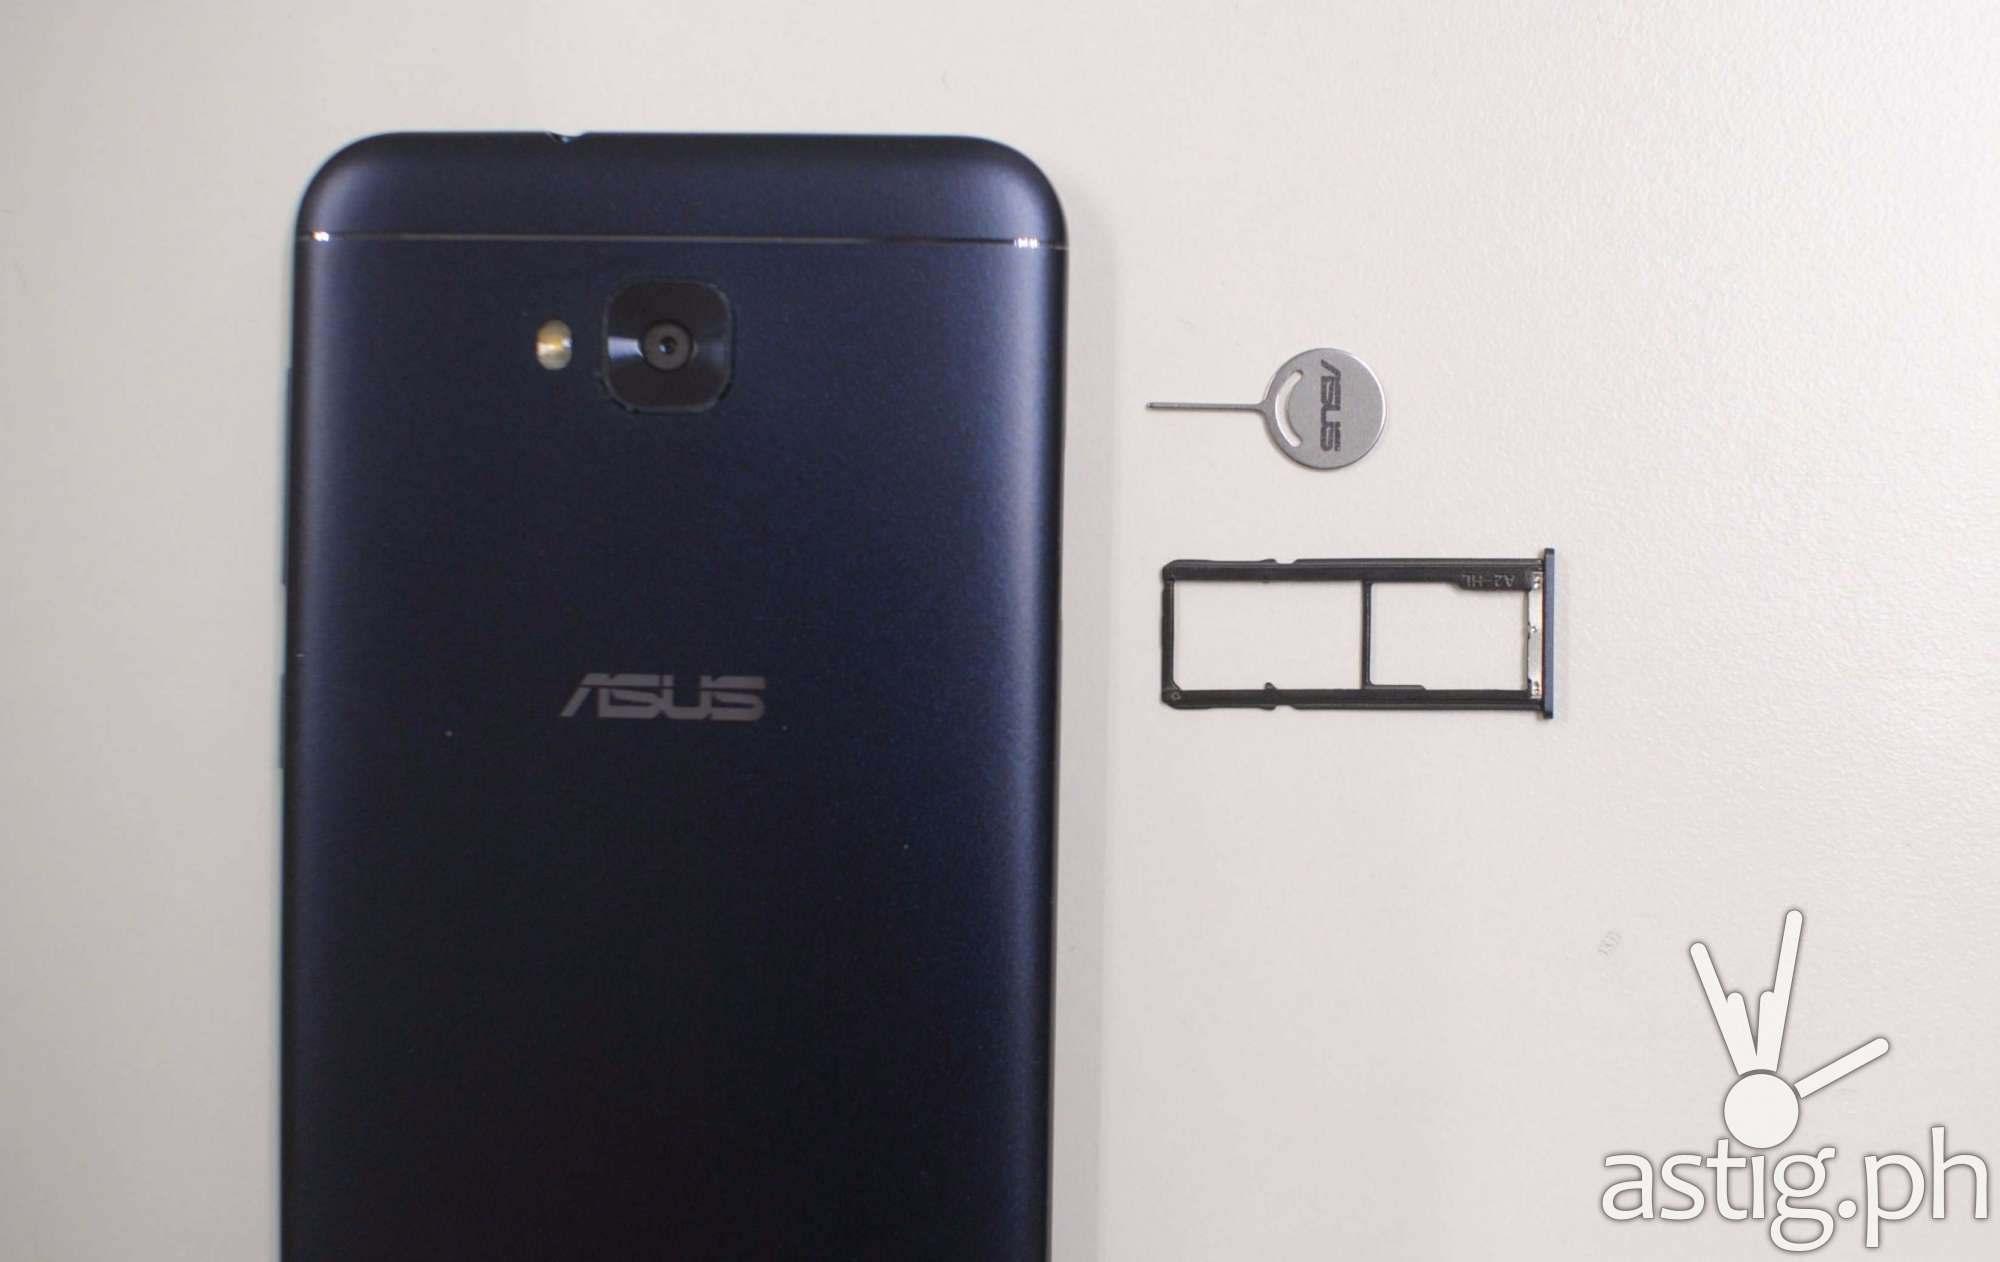 ASUS Zenfone 4 Selfie Dual SIM and MicroSD tray